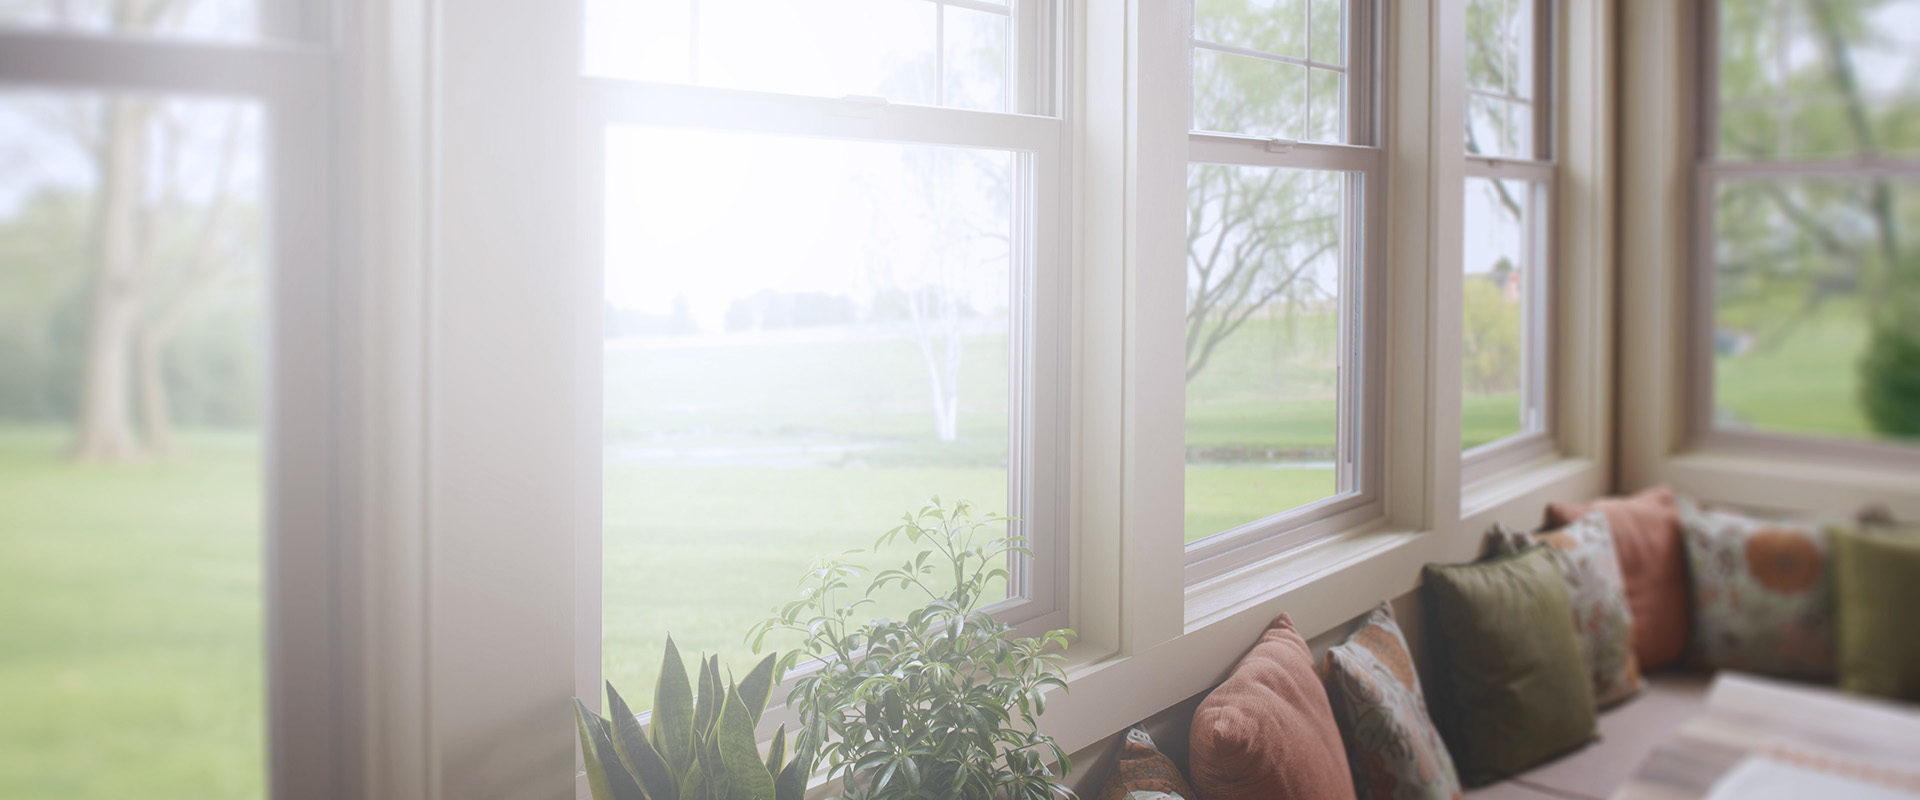 Картинка окно в коттедж фон